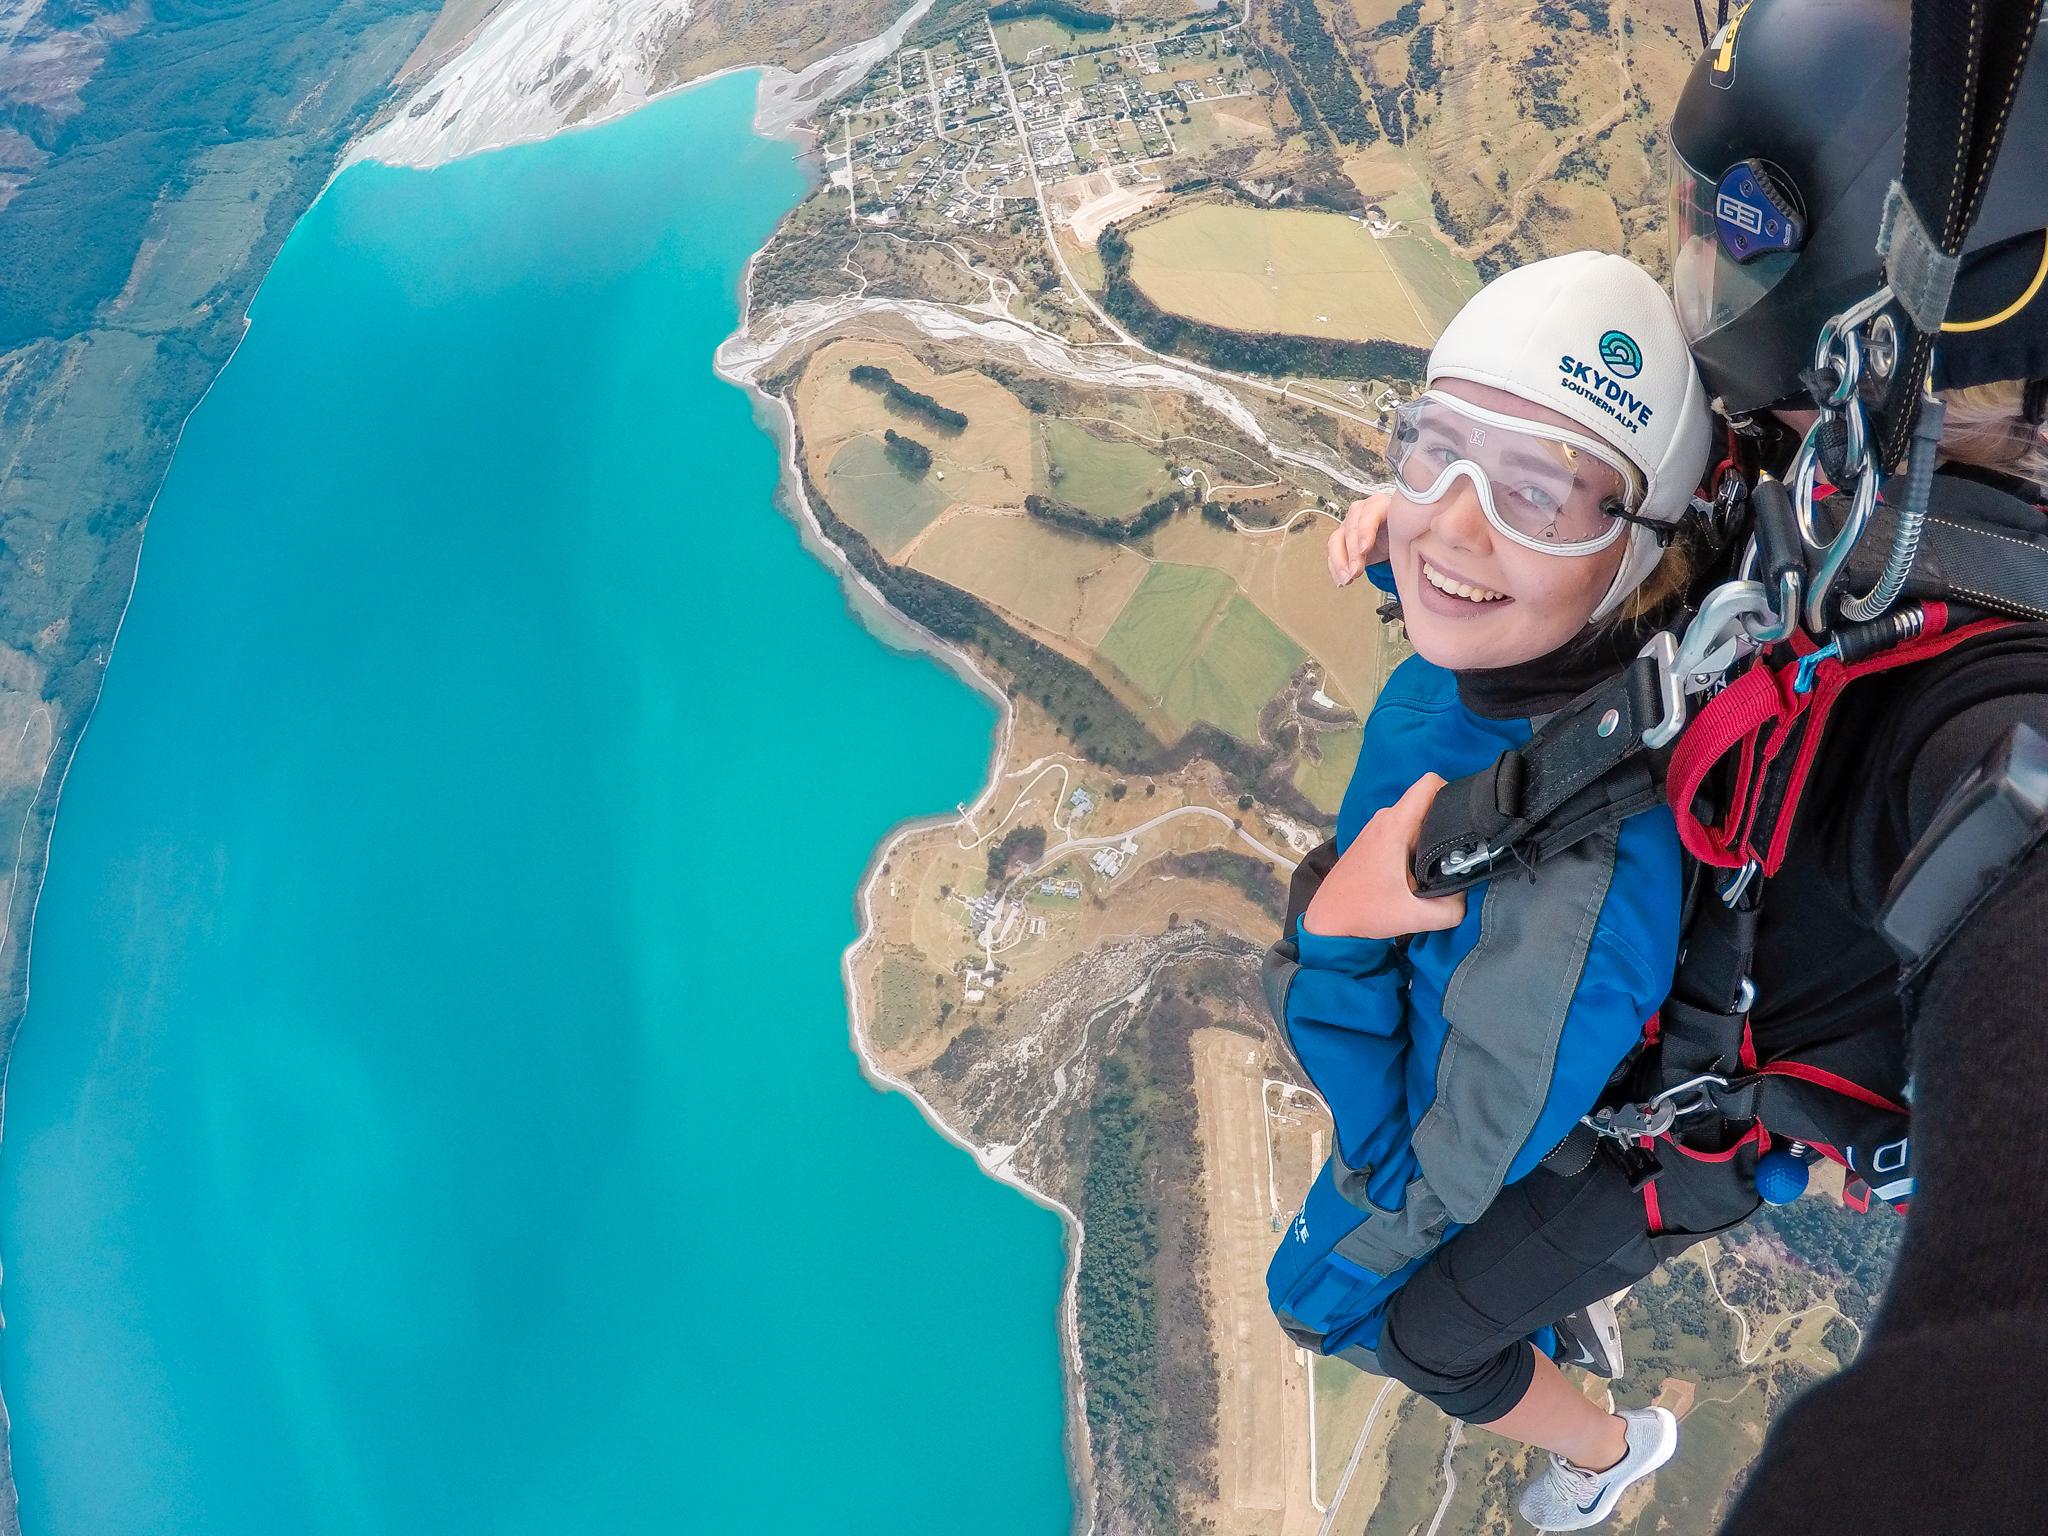 Skydiva southern alps-5